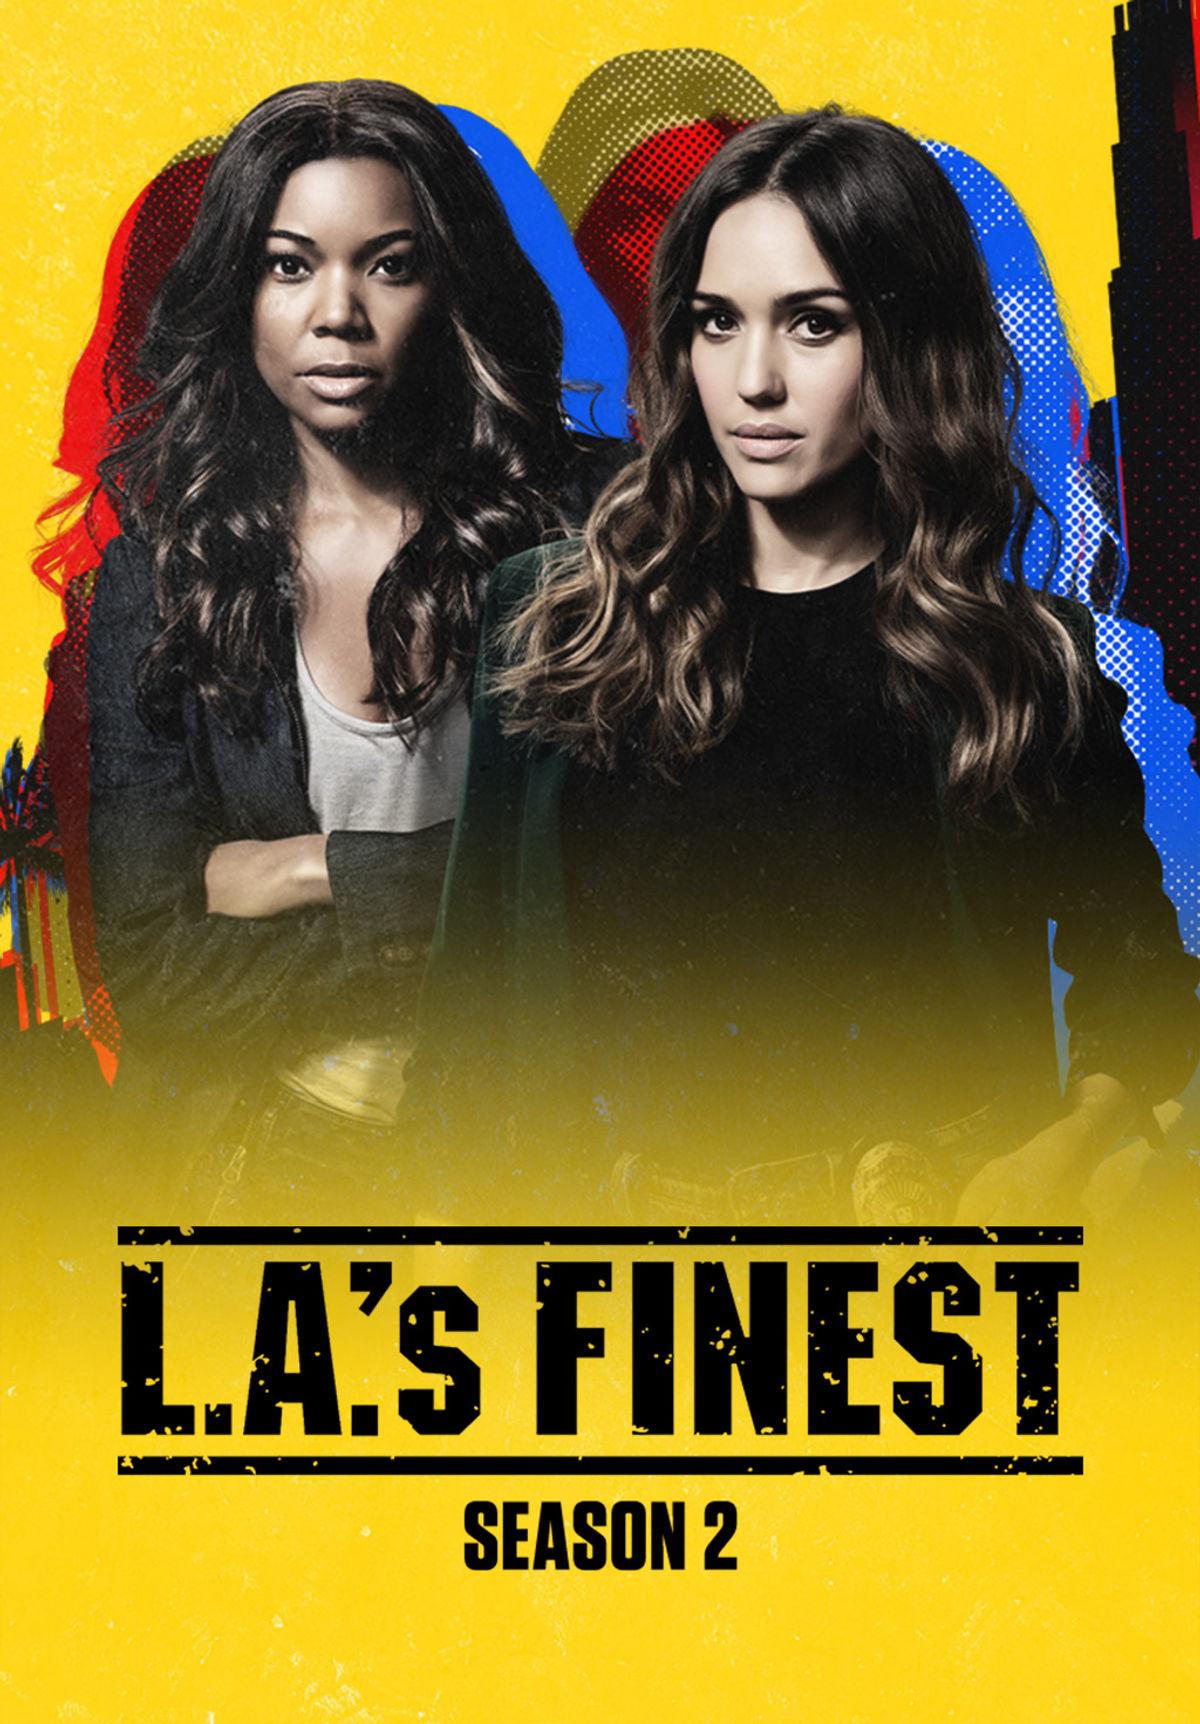 L.A.s Finest